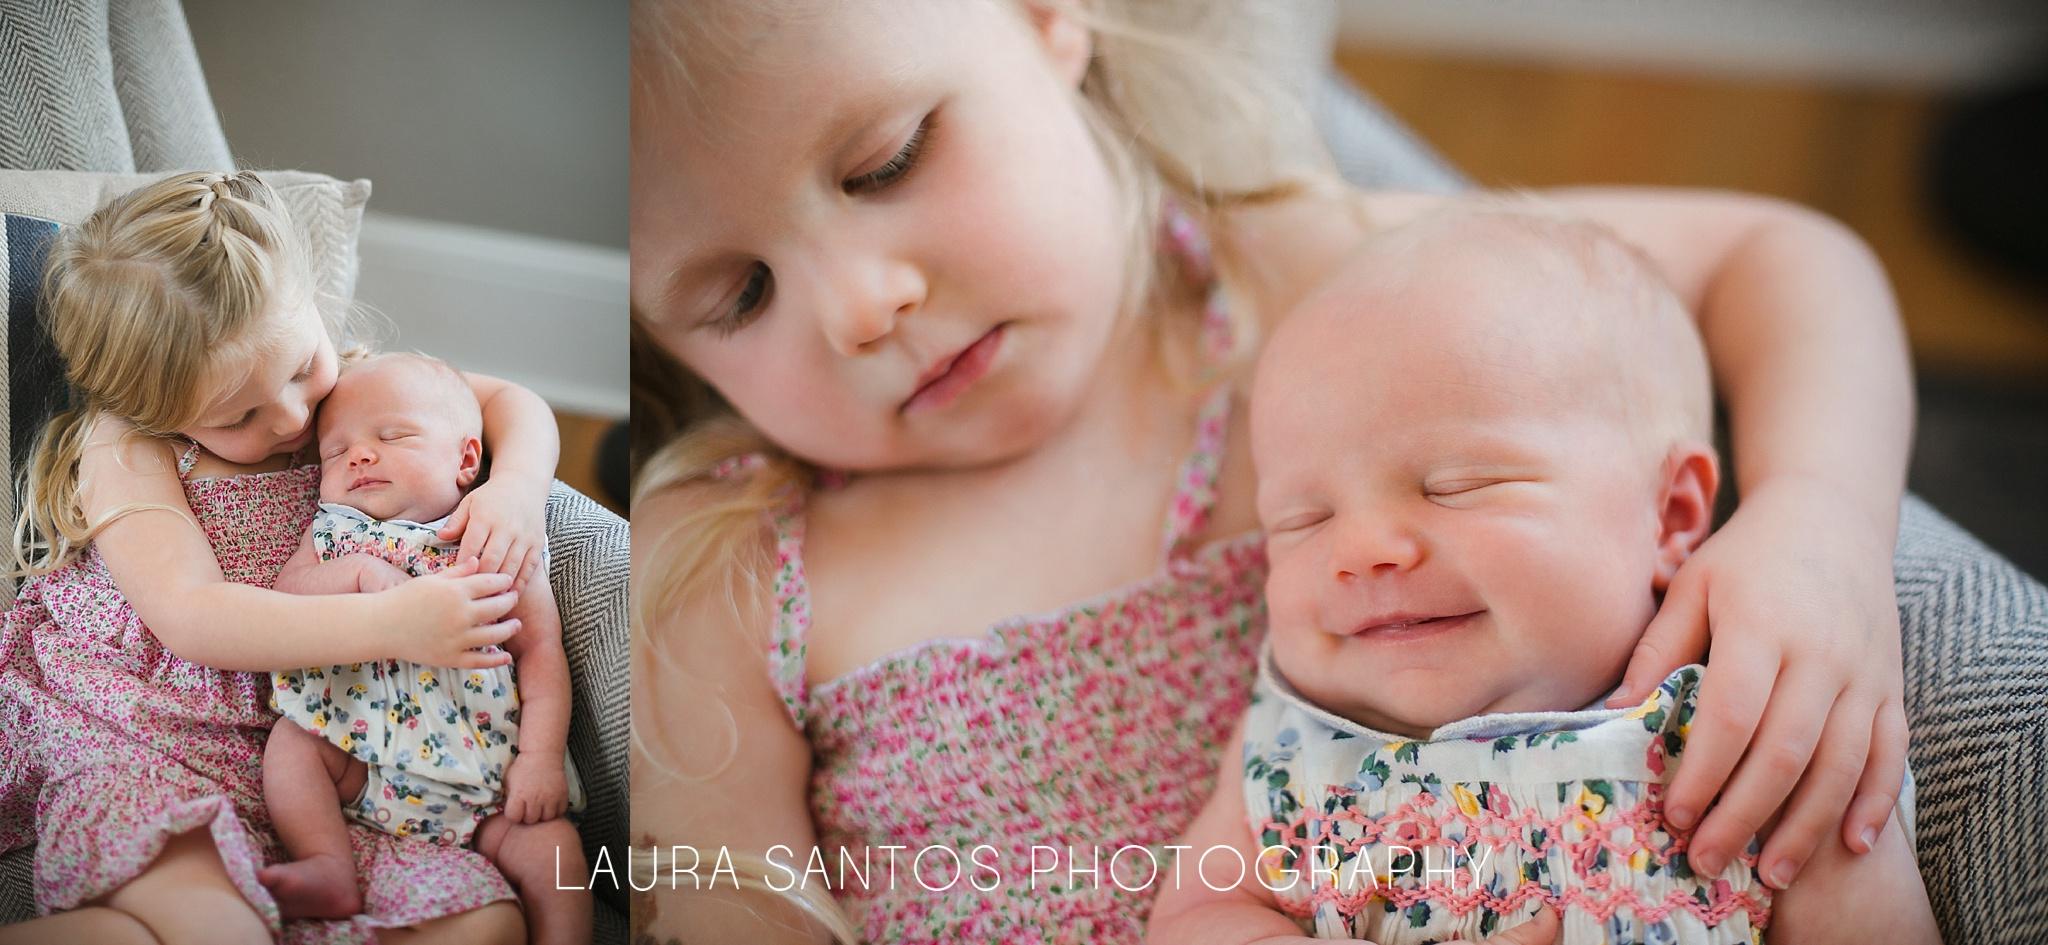 Laura Santos Photography Portland Oregon Family Photographer_0277.jpg